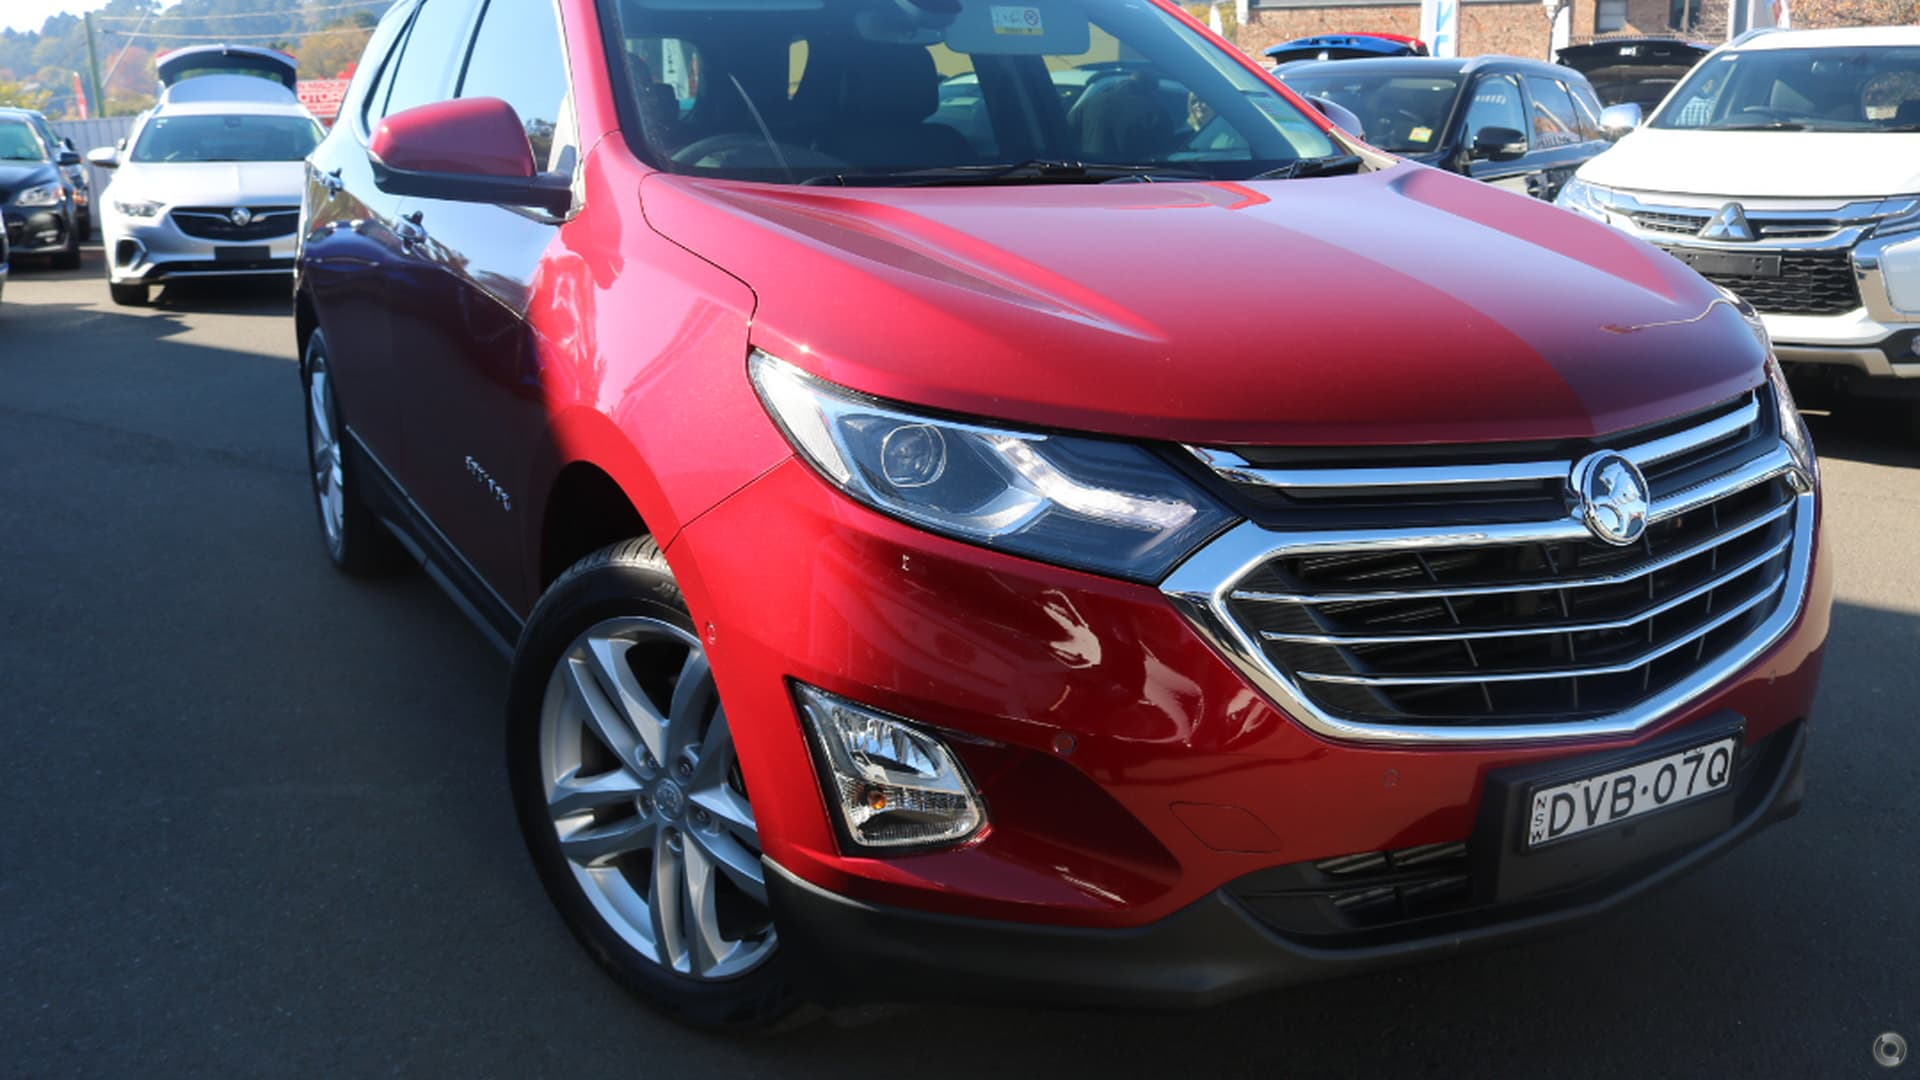 2017 Holden Equinox Ltz